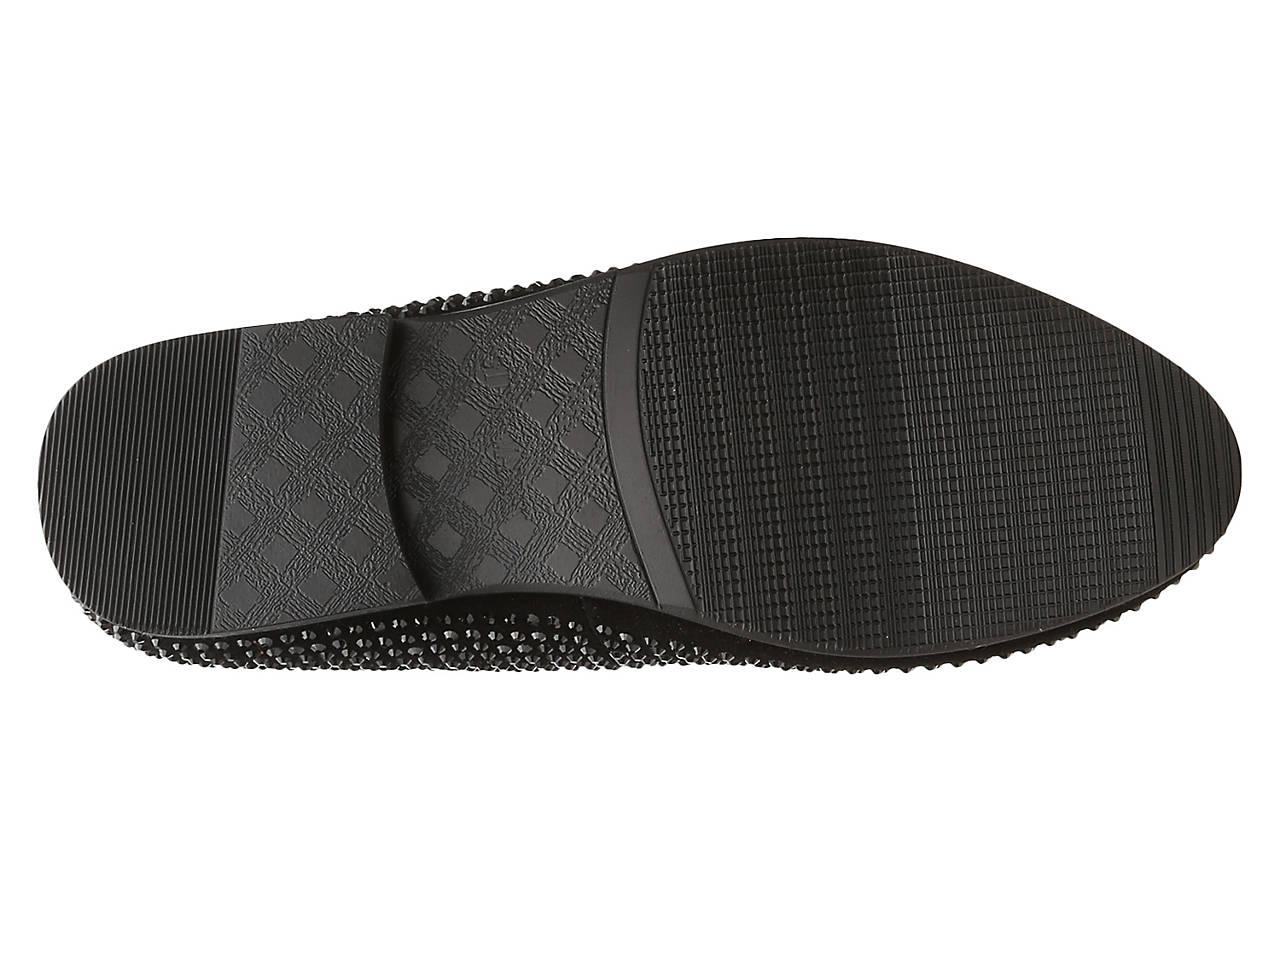 589f7db1cdd Caviarr Loafer